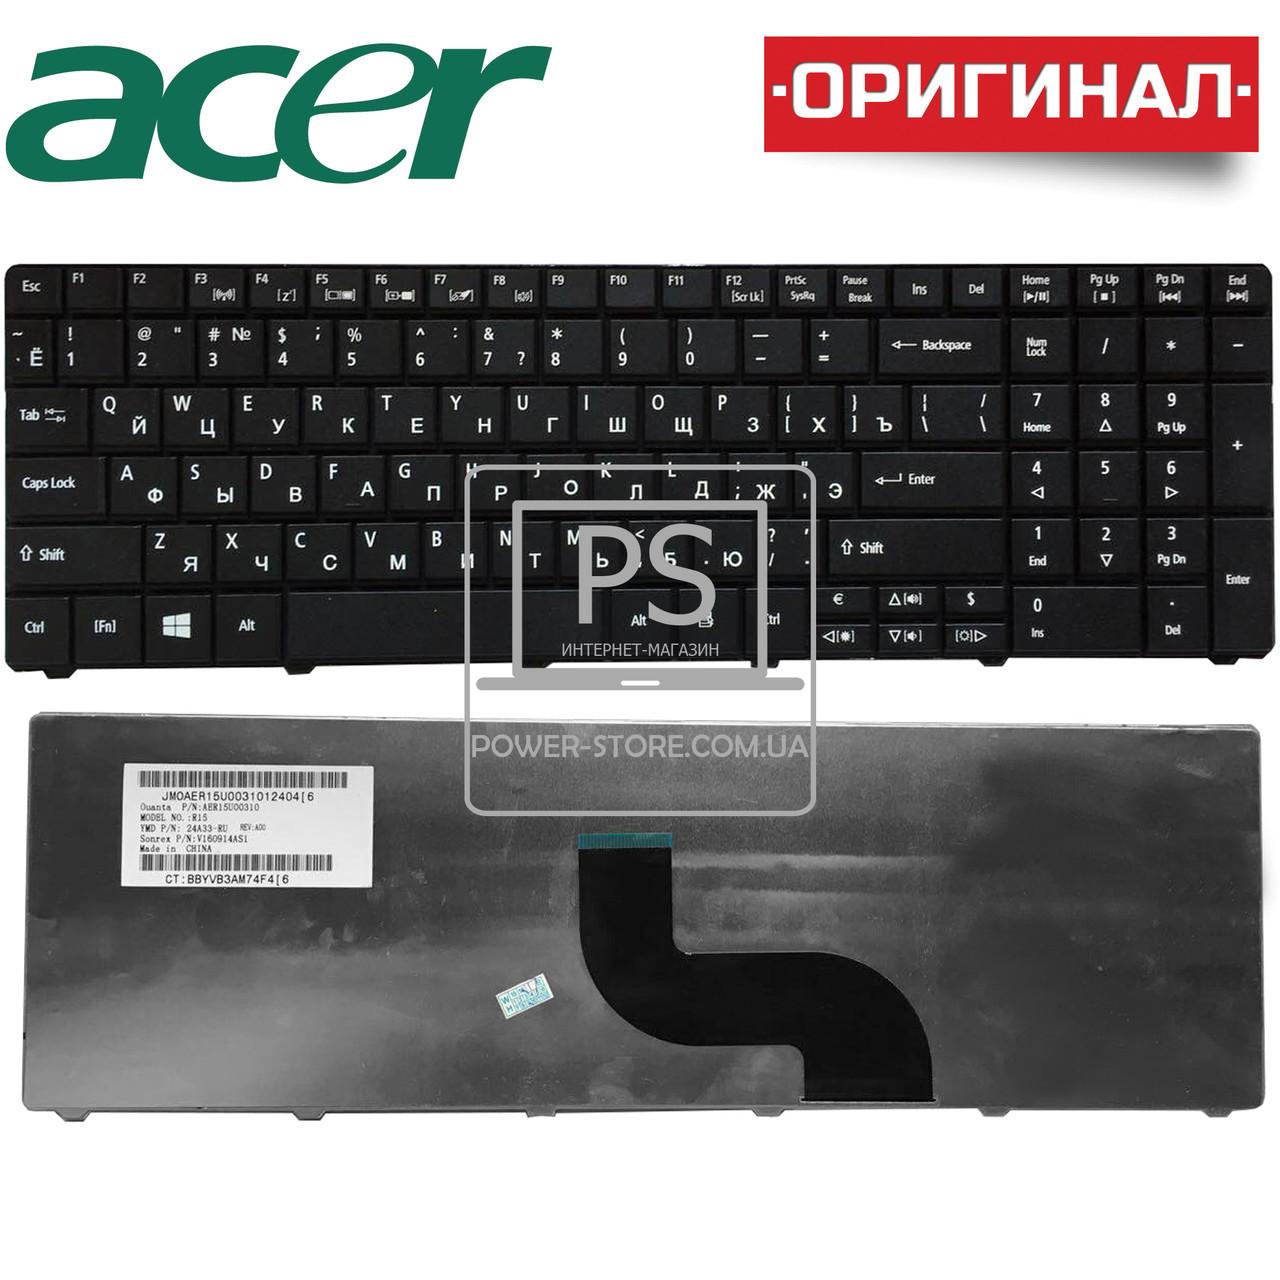 Клавиатура  для ноутбука ACER  eMachines E735, eMachines G430, eMachines G525, eMachines G625,